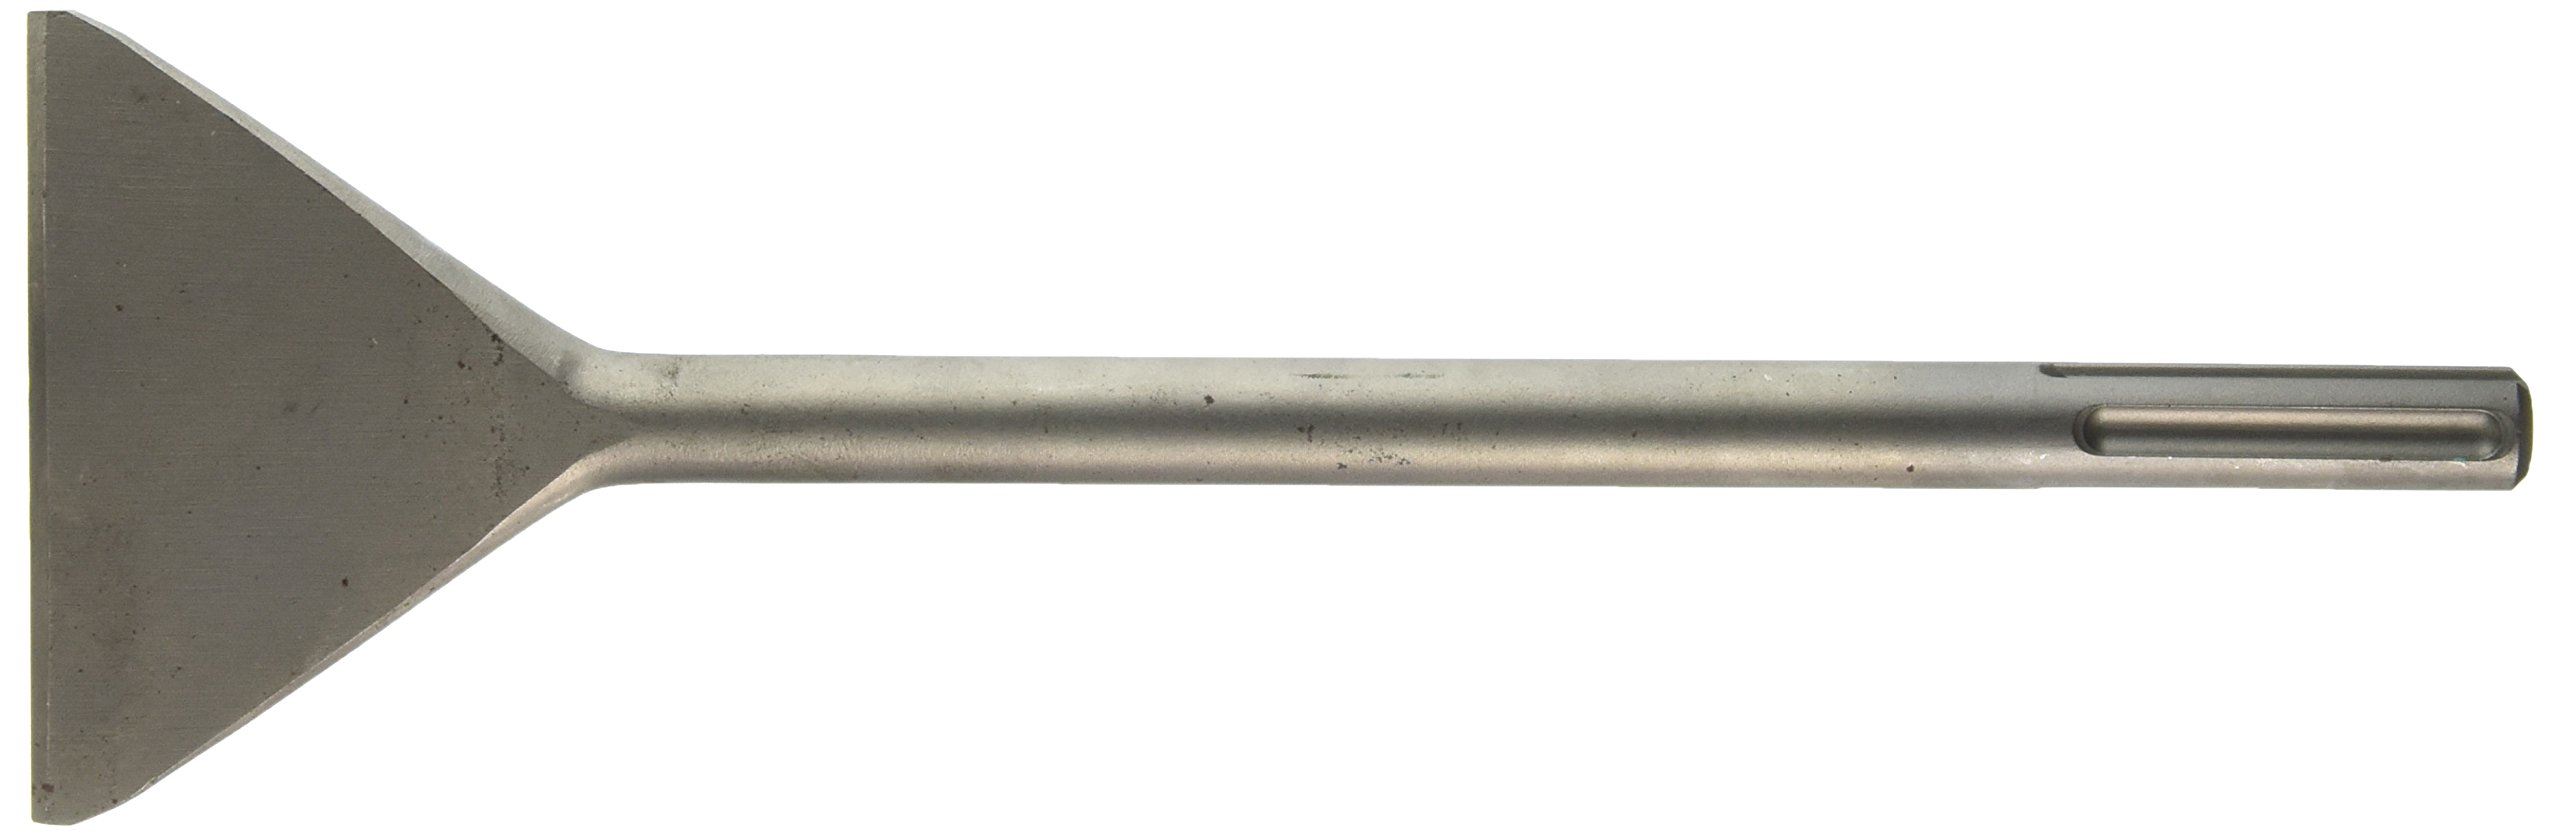 Heller Tools 258890 Spade chisel ''2511'' of SDS-Max, 3.94'' x 13.78''